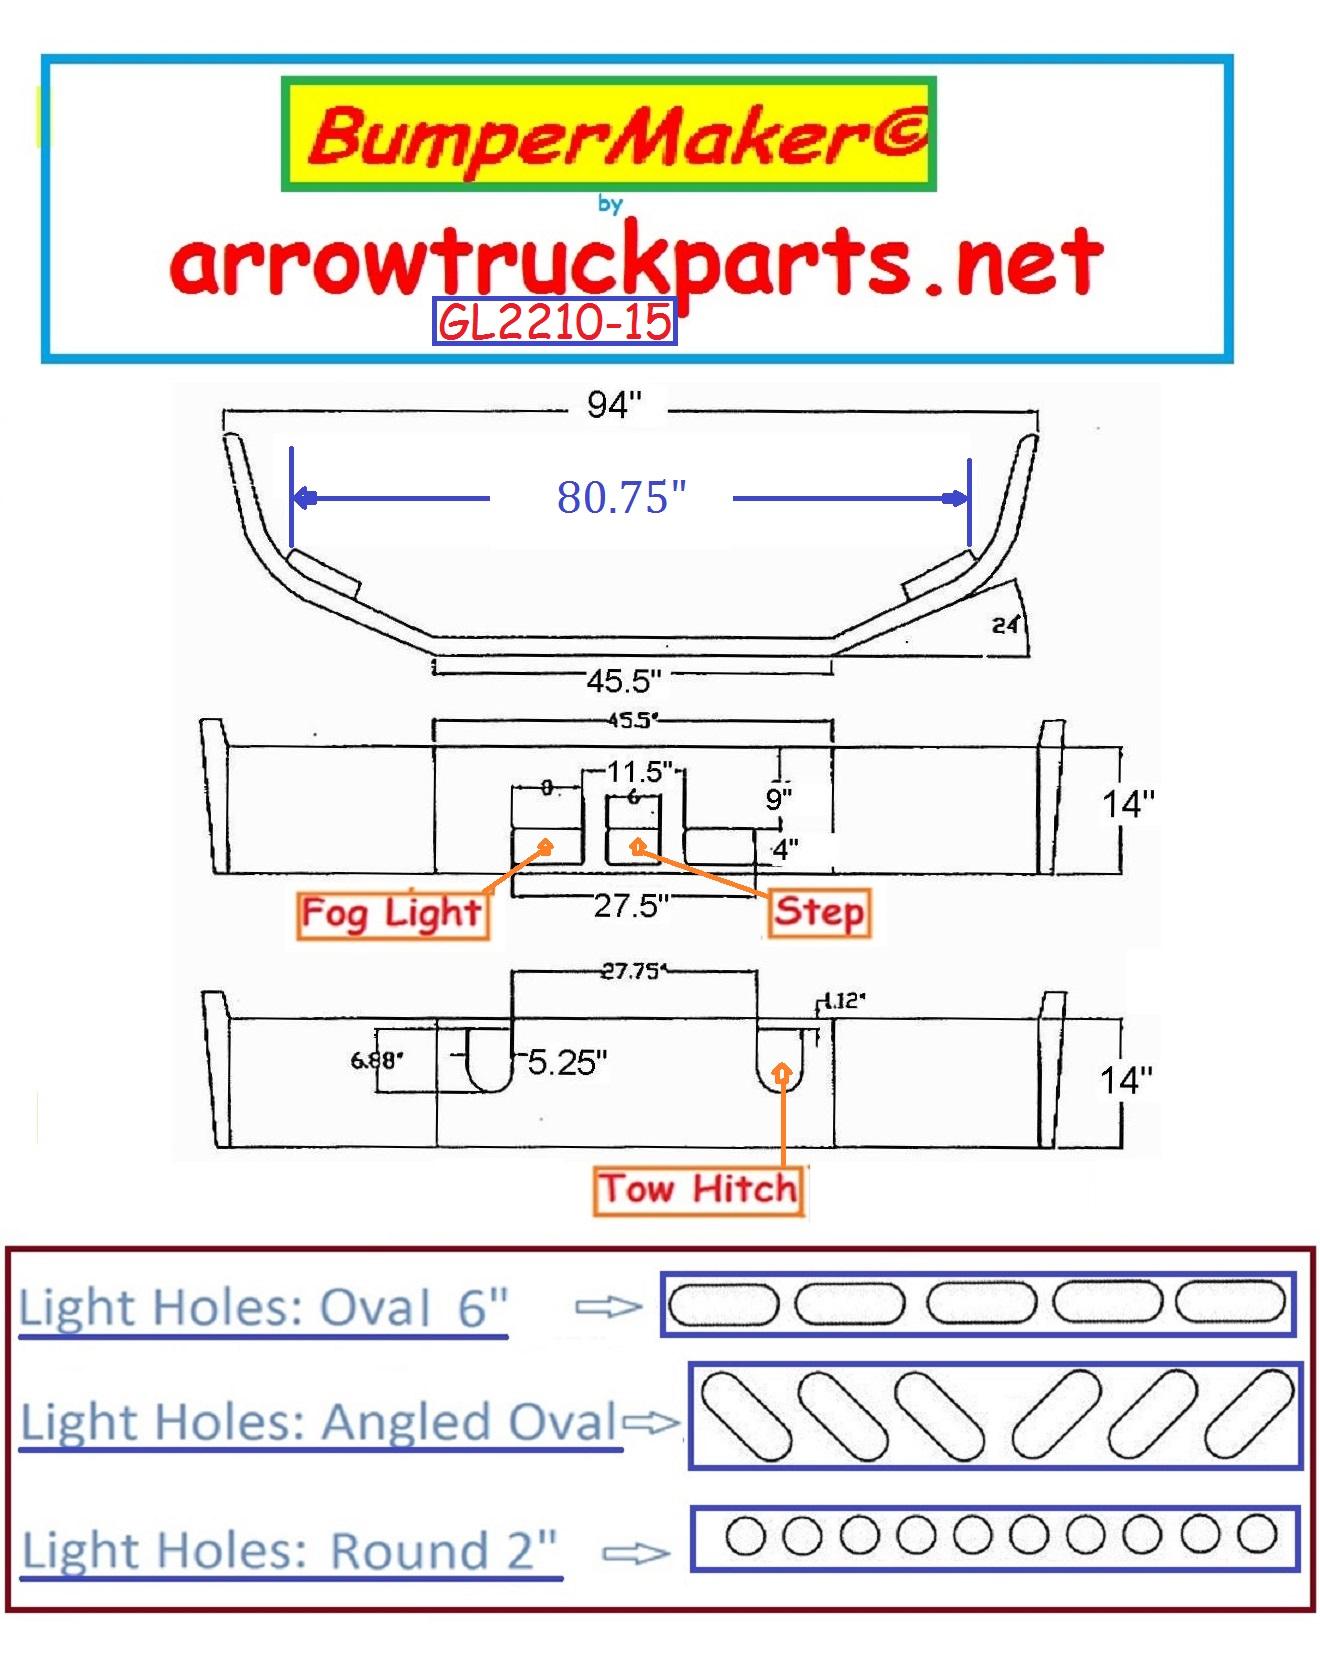 97 mack truck wiring diagram